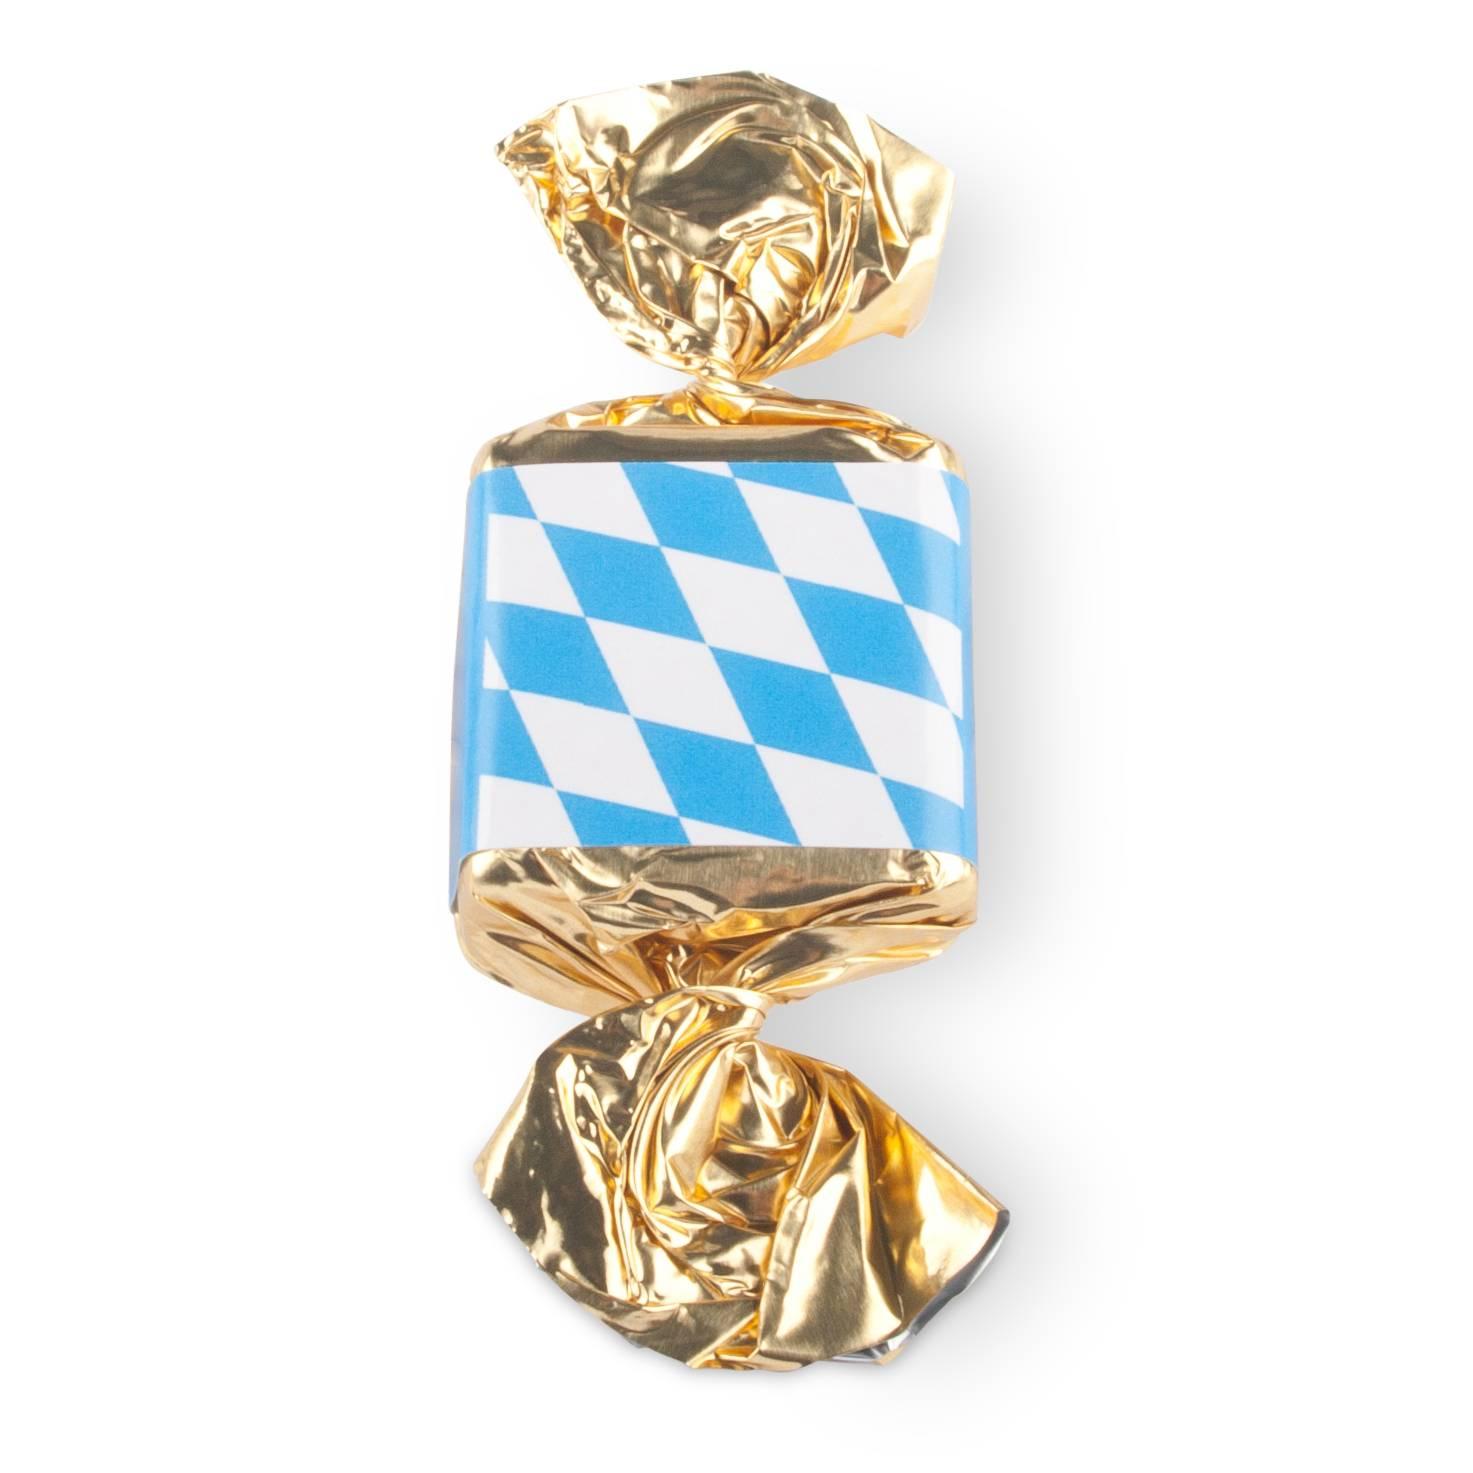 Mitbringsel Aus Bayern